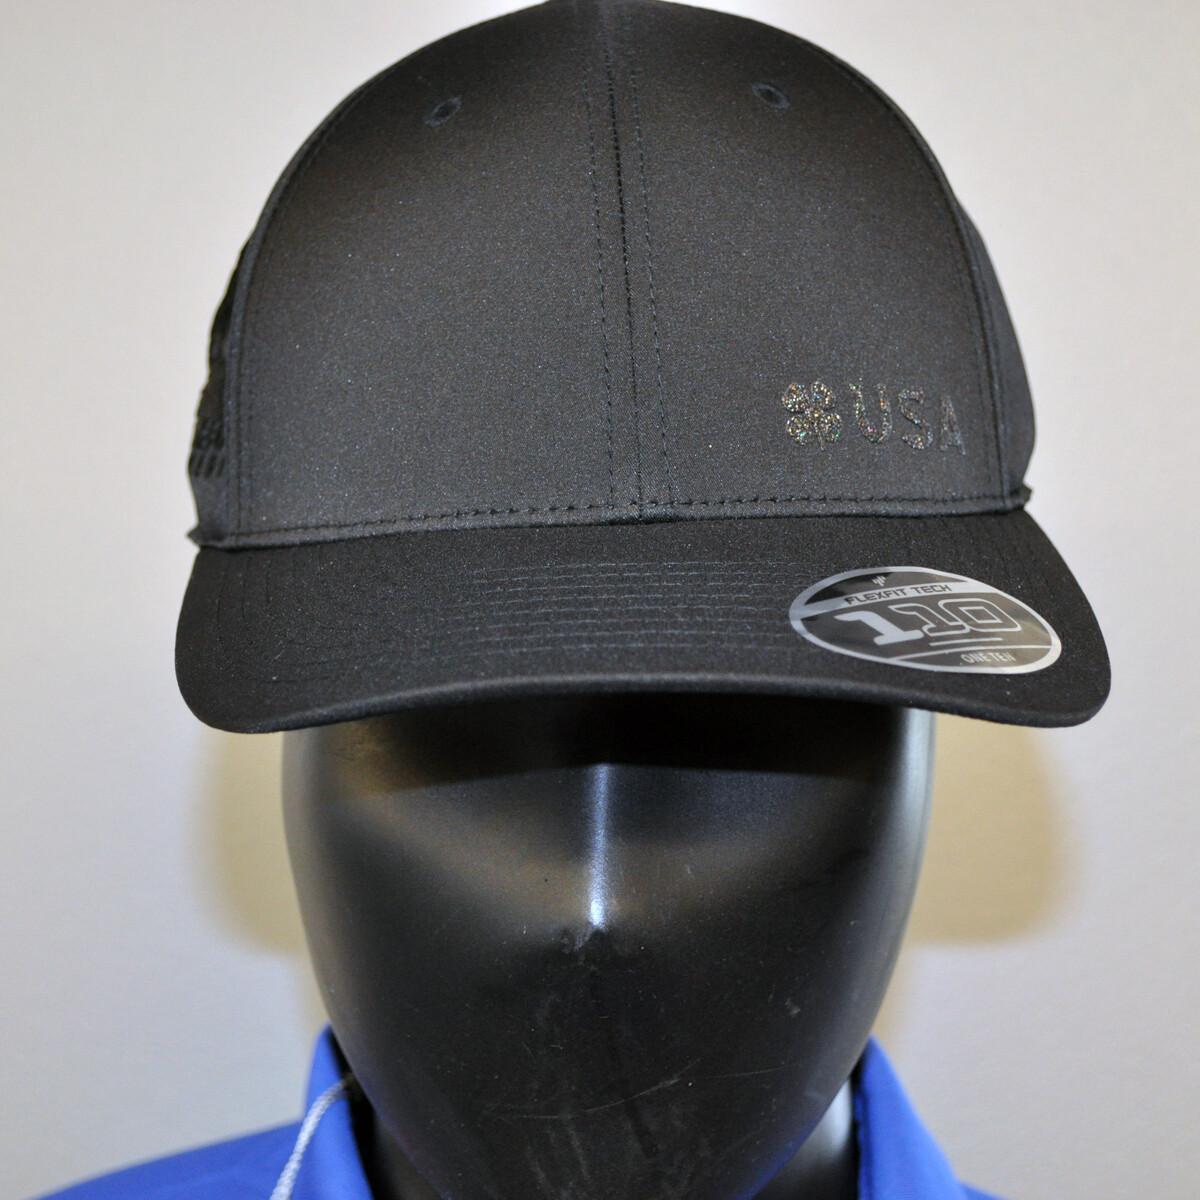 Women's Golf Hat - Black Clover Ladies - OSFA Black